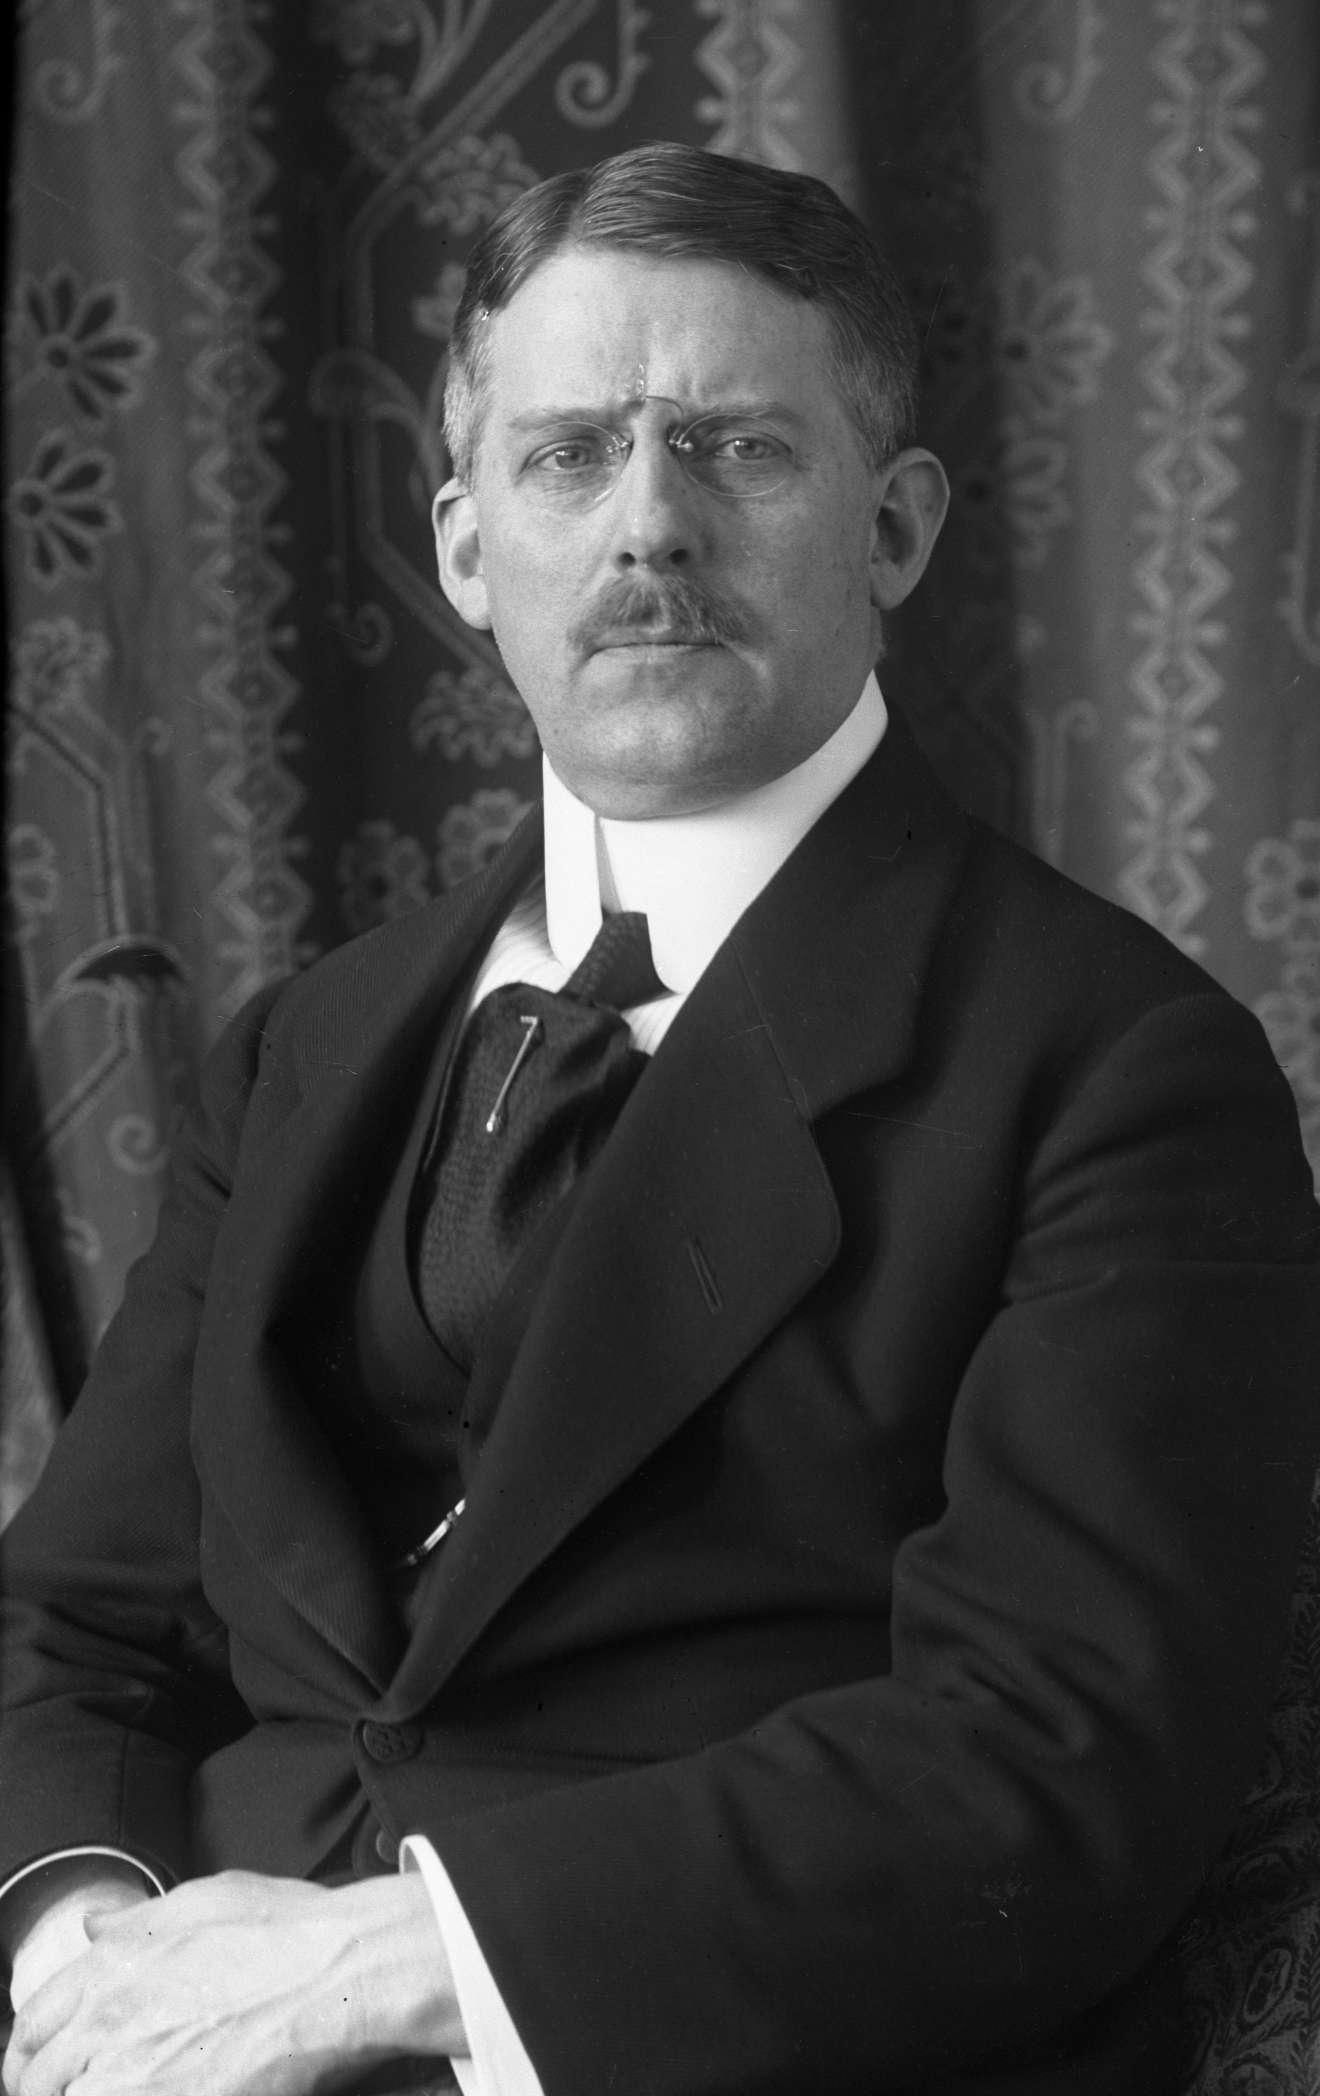 Image of Gustav Borgen from Wikidata